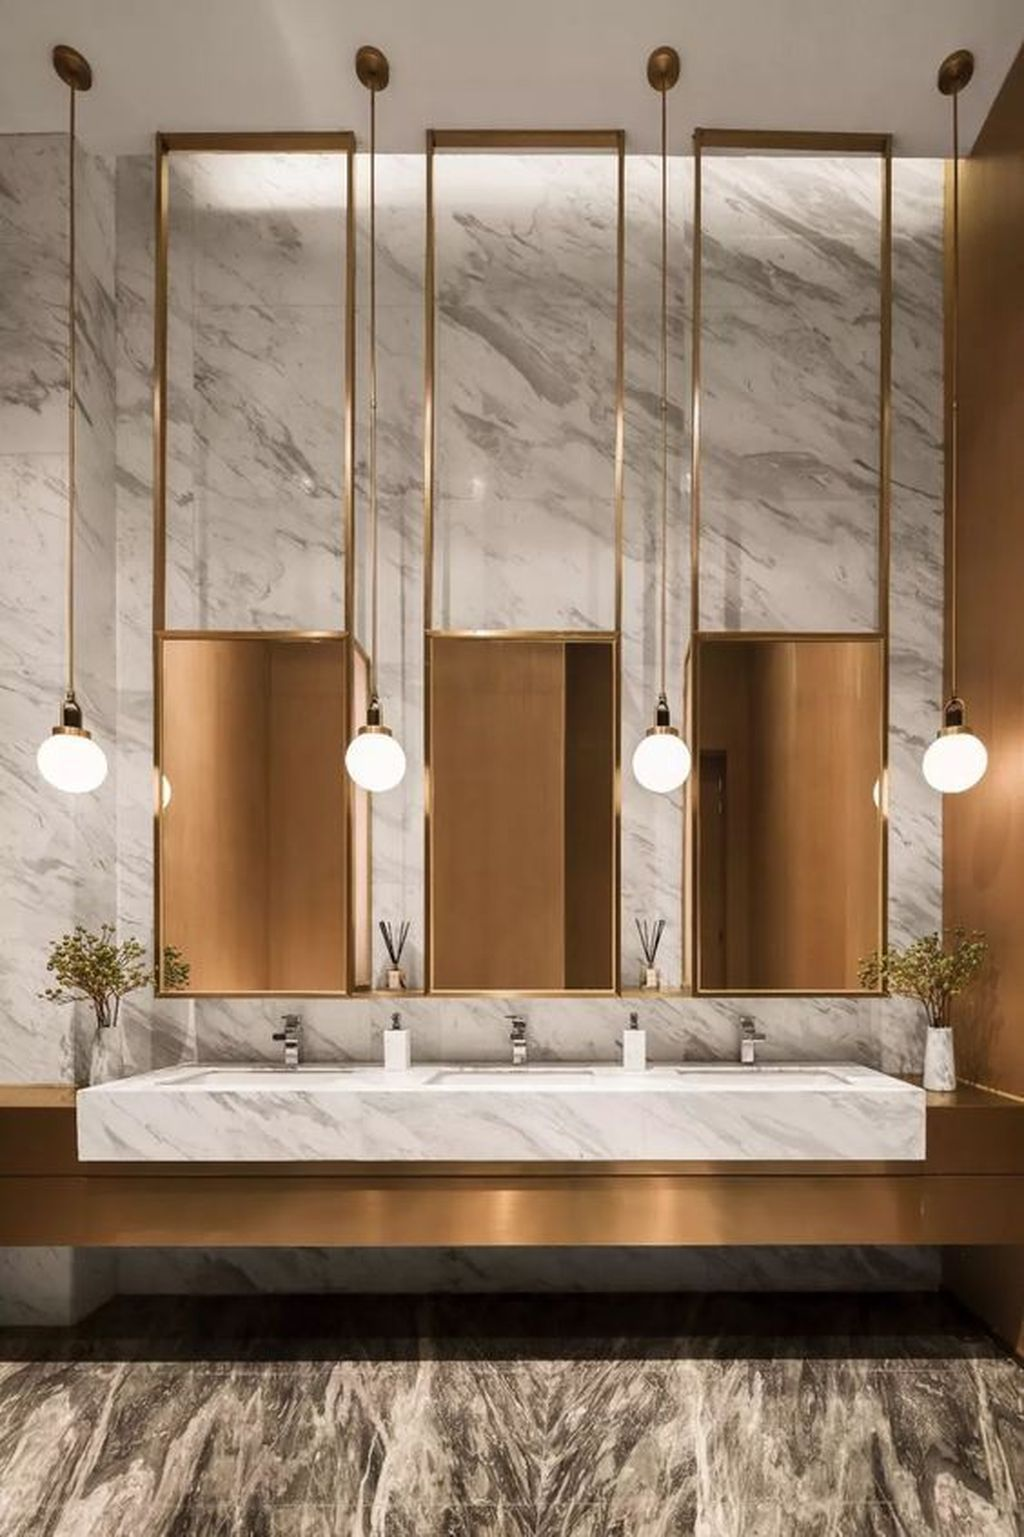 48 Simple Stone Bathroom Design Ideas Toilet Design Modern Bathroom Design Bathroom Interior Design